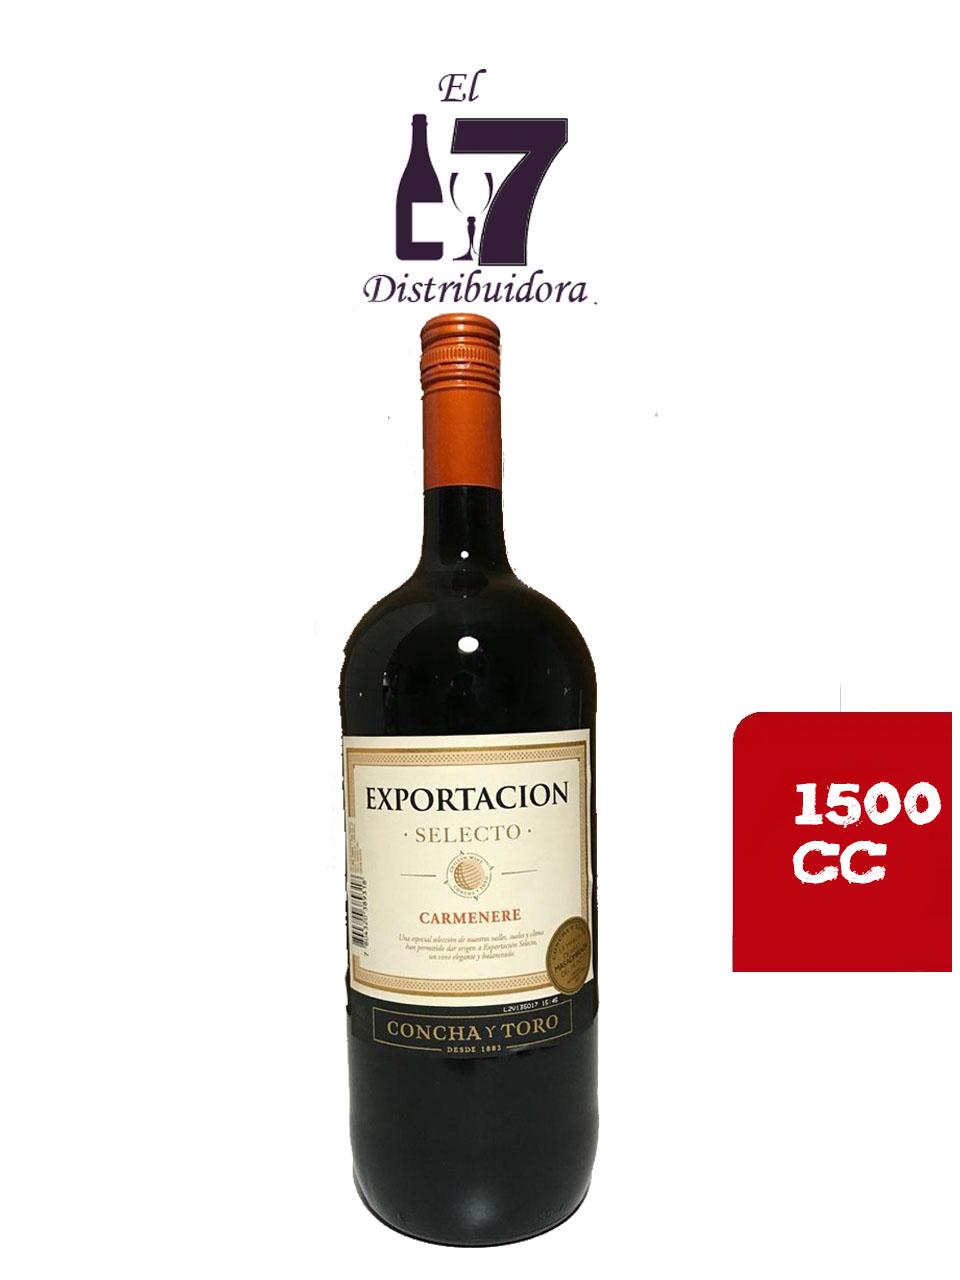 Exportacion Concha y Toro Carmenere botellon x 6 unidades